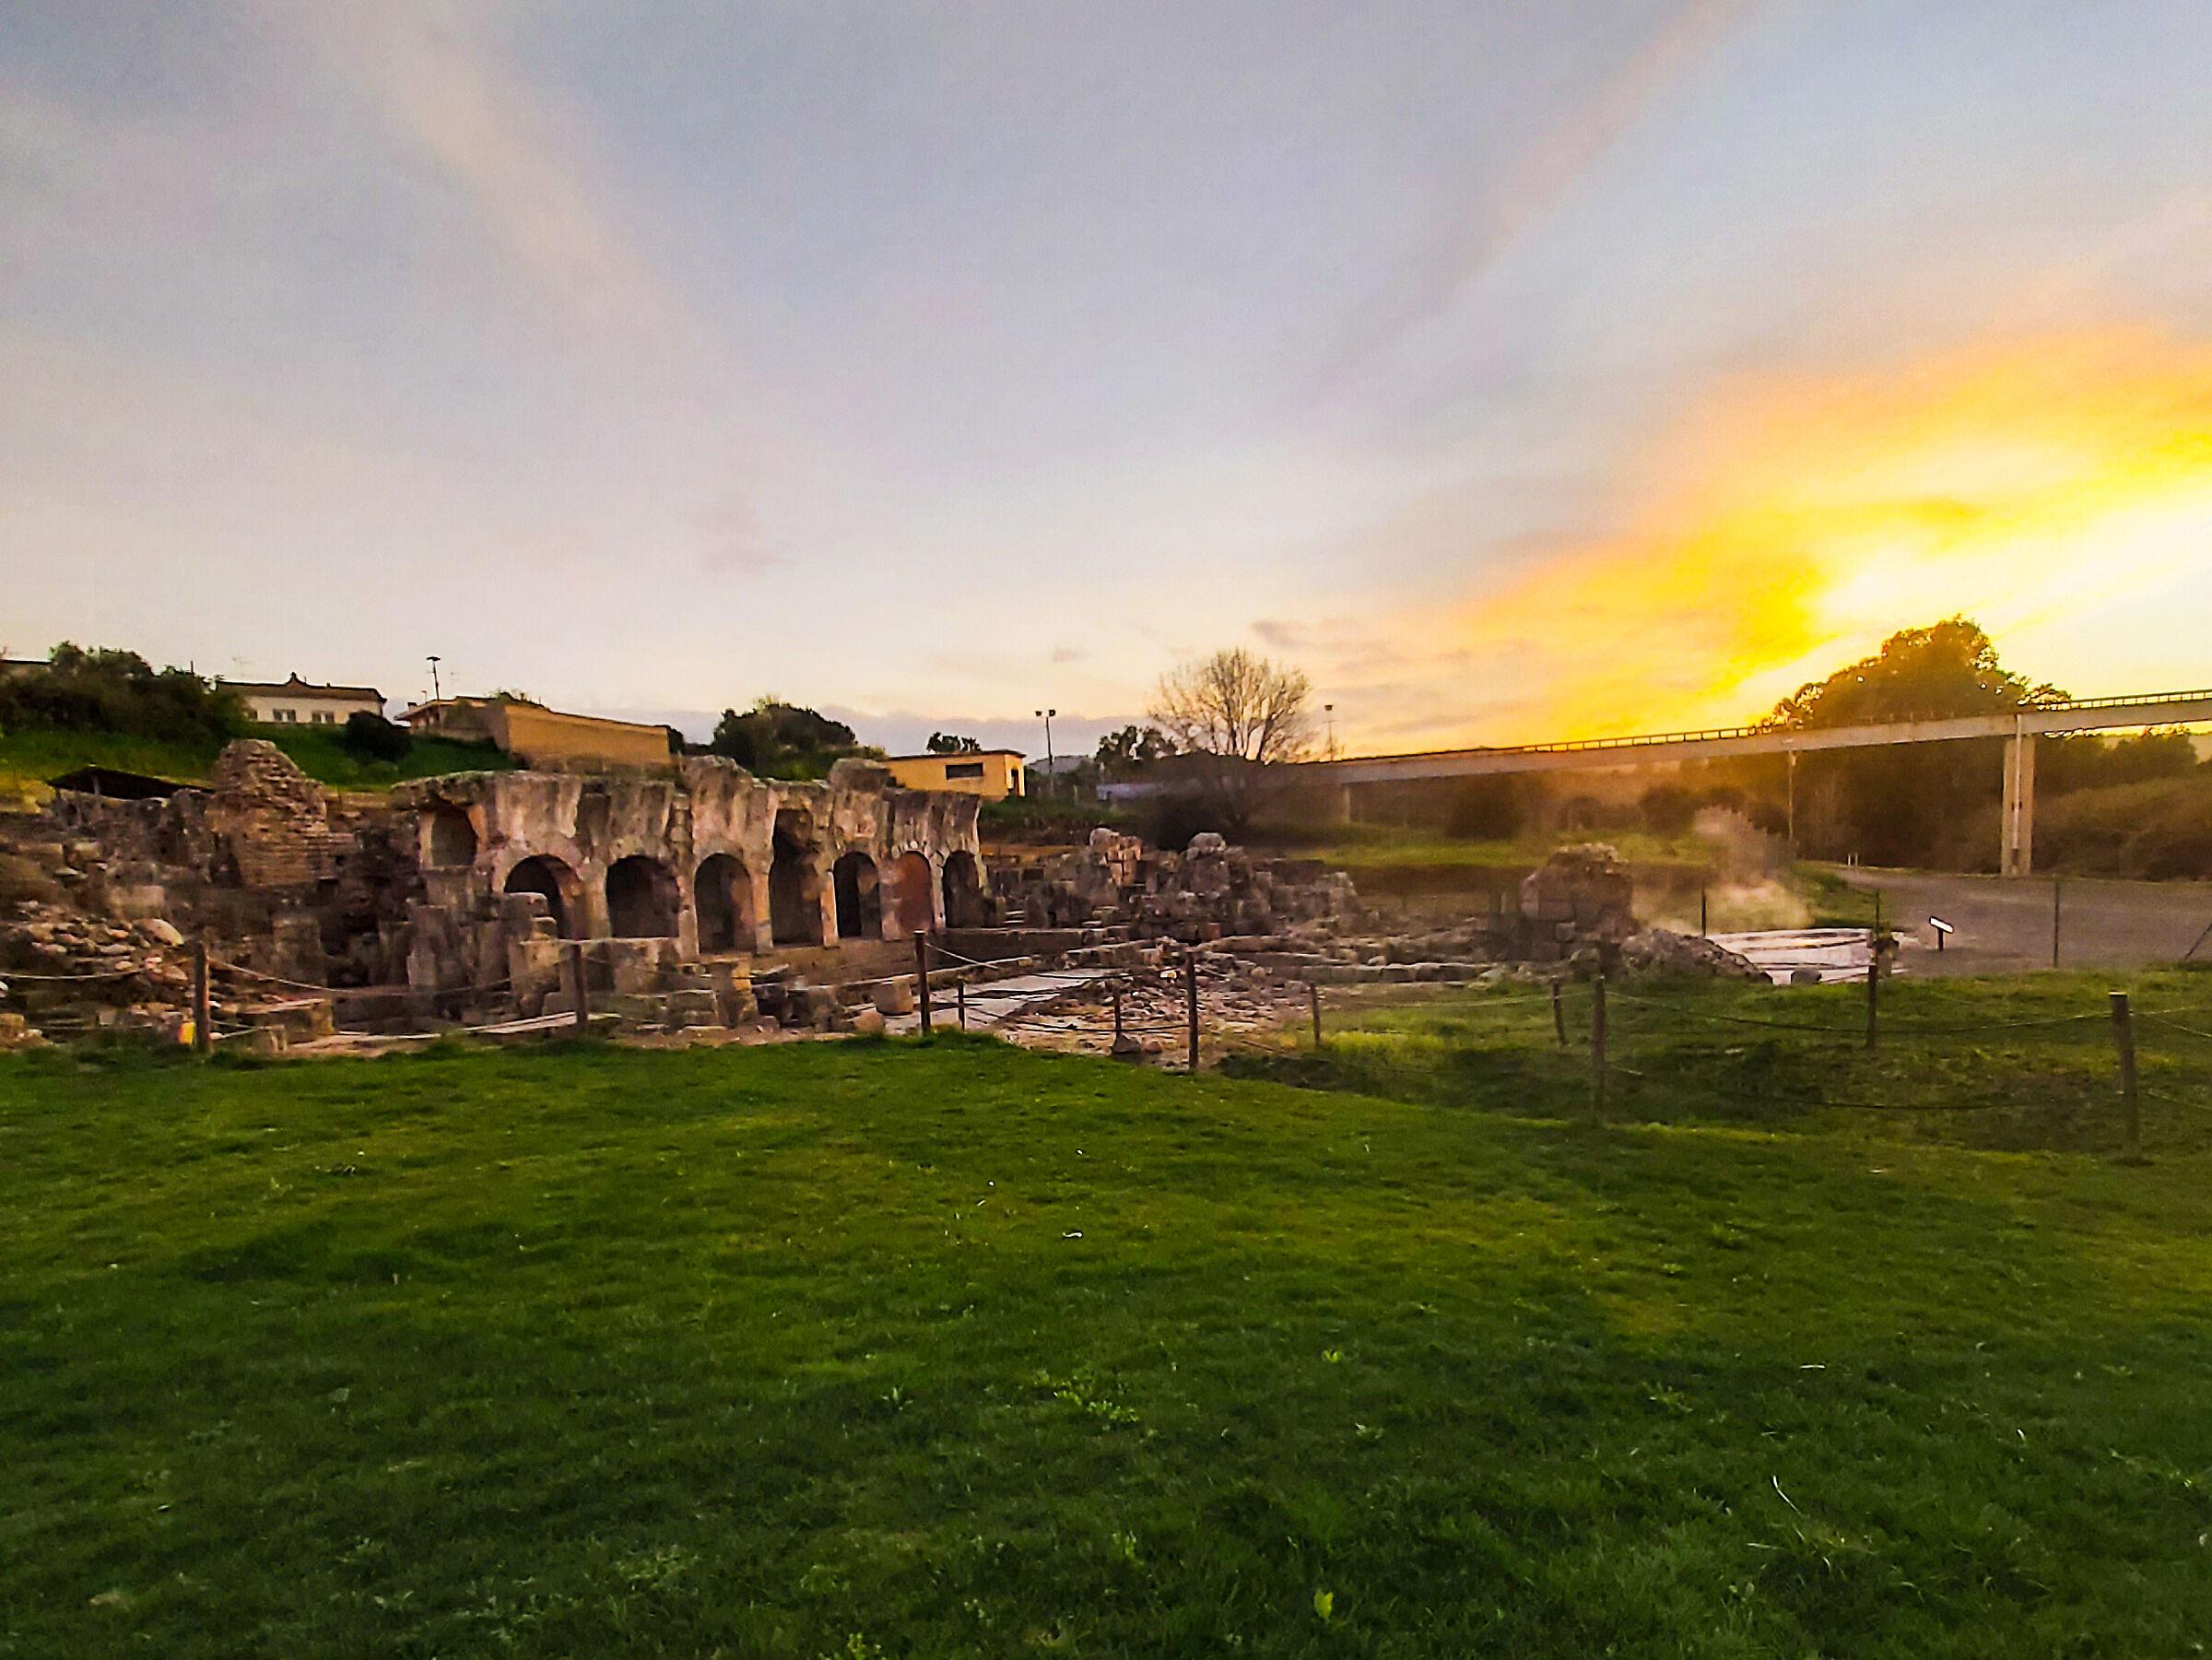 Sunset at The Fordongianus Baths ...